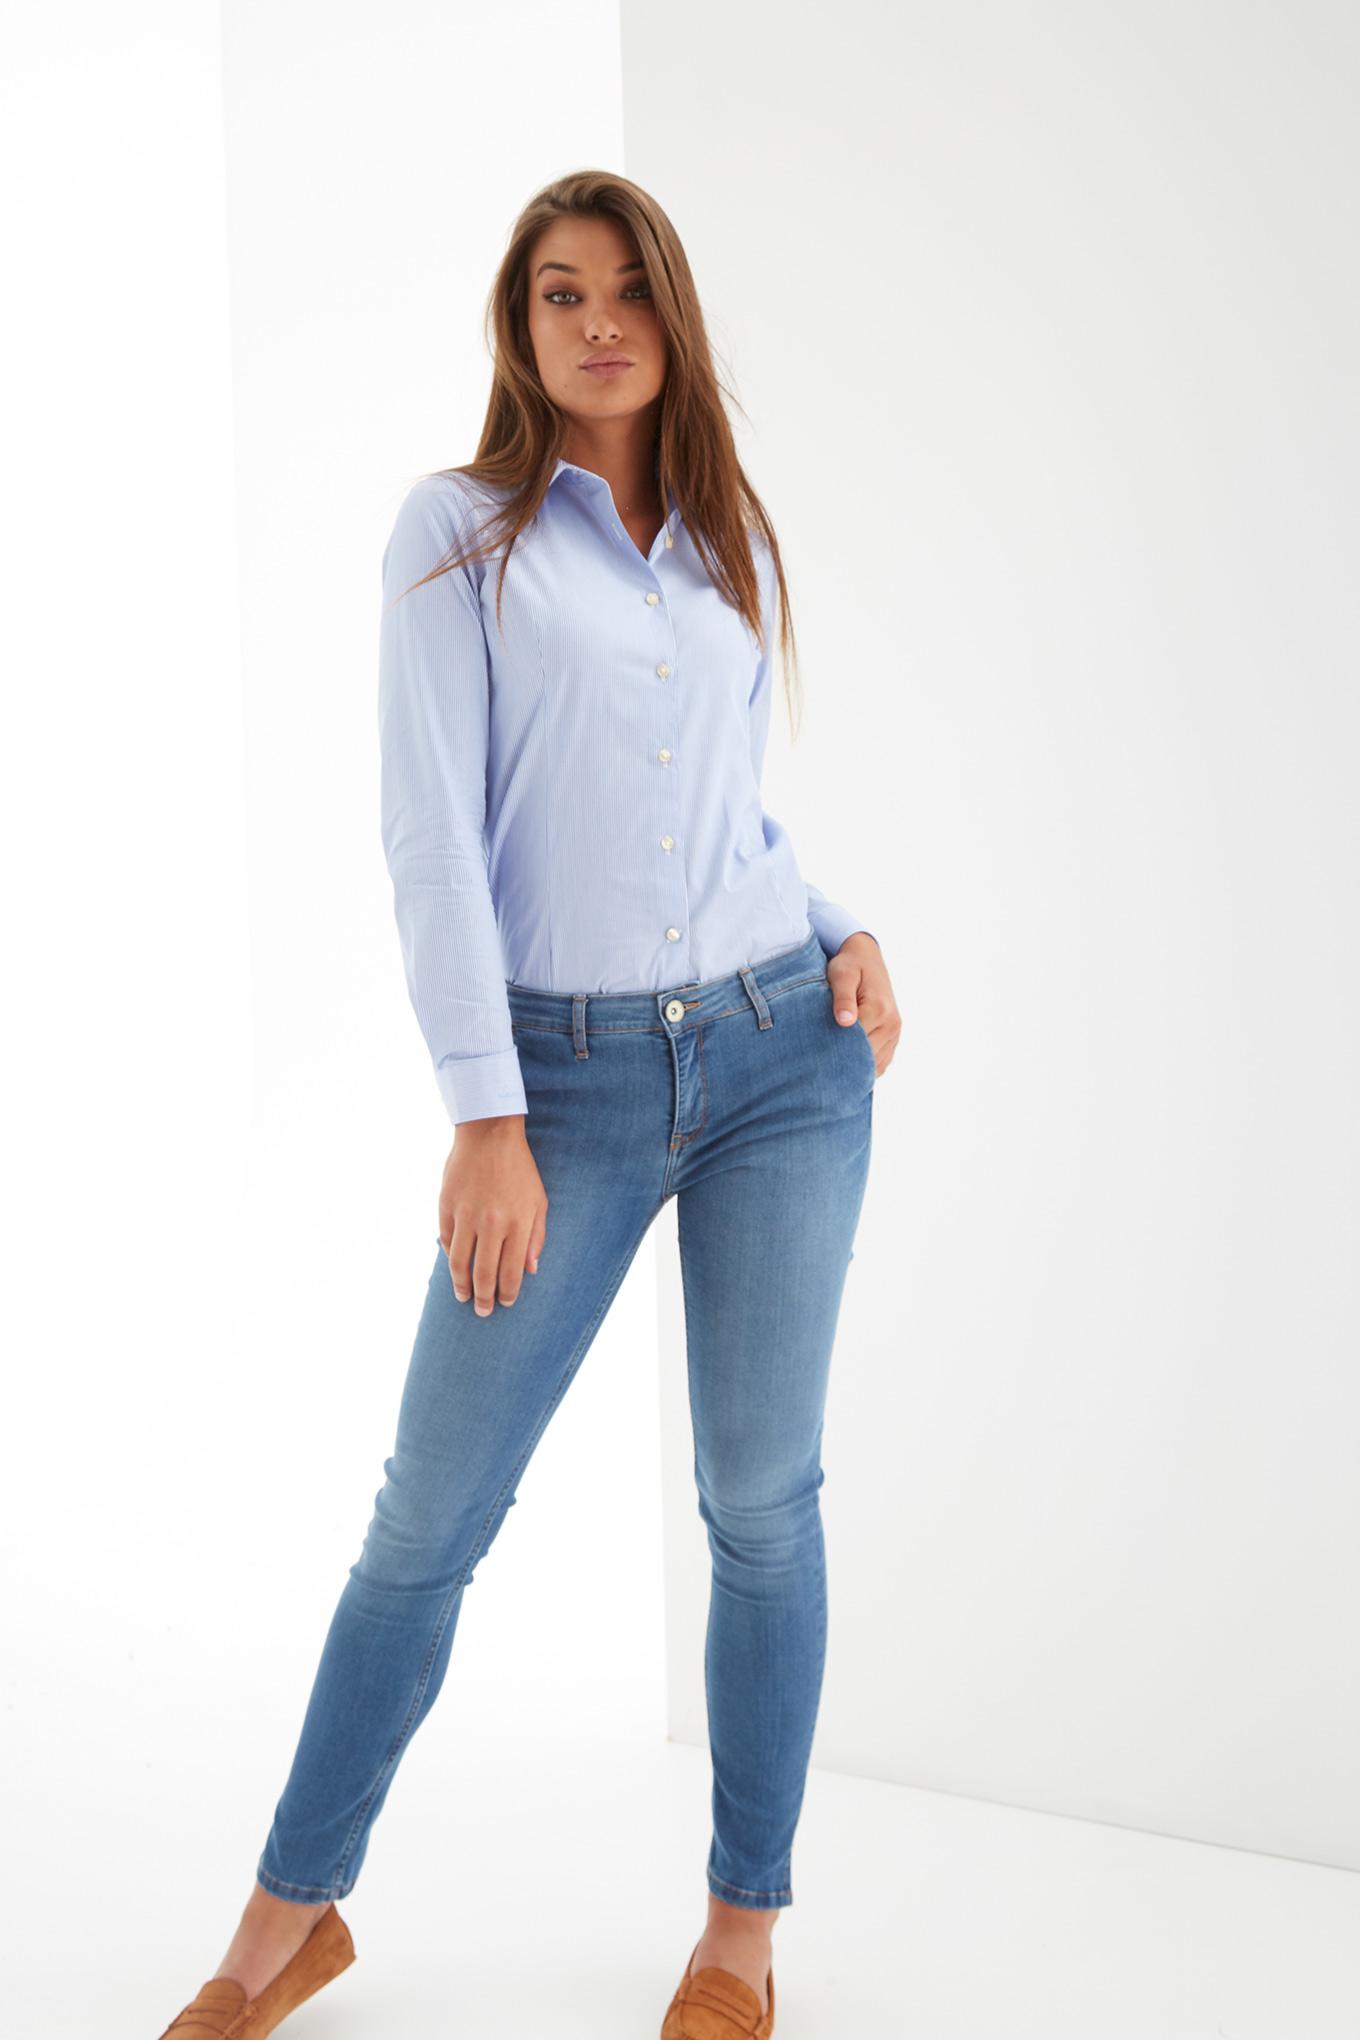 Shirt Stripes Classic Woman